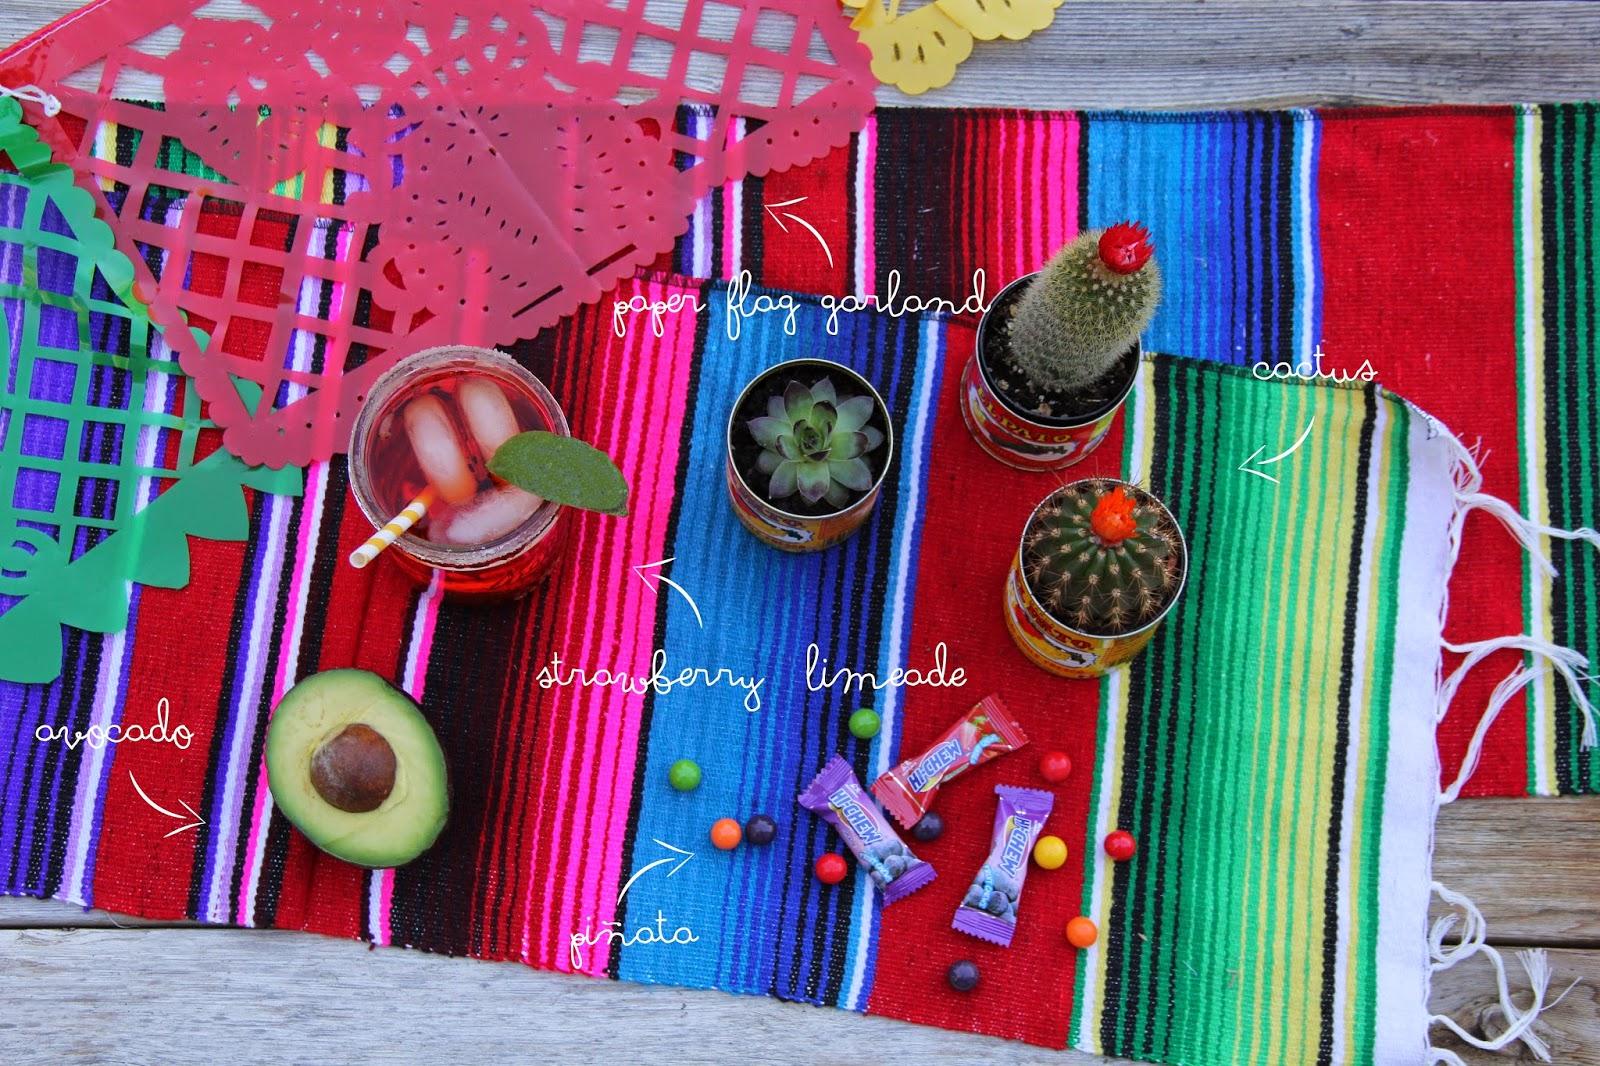 Cactus, piñata, guacamole, chips and salsa, garland, strawberry limeade